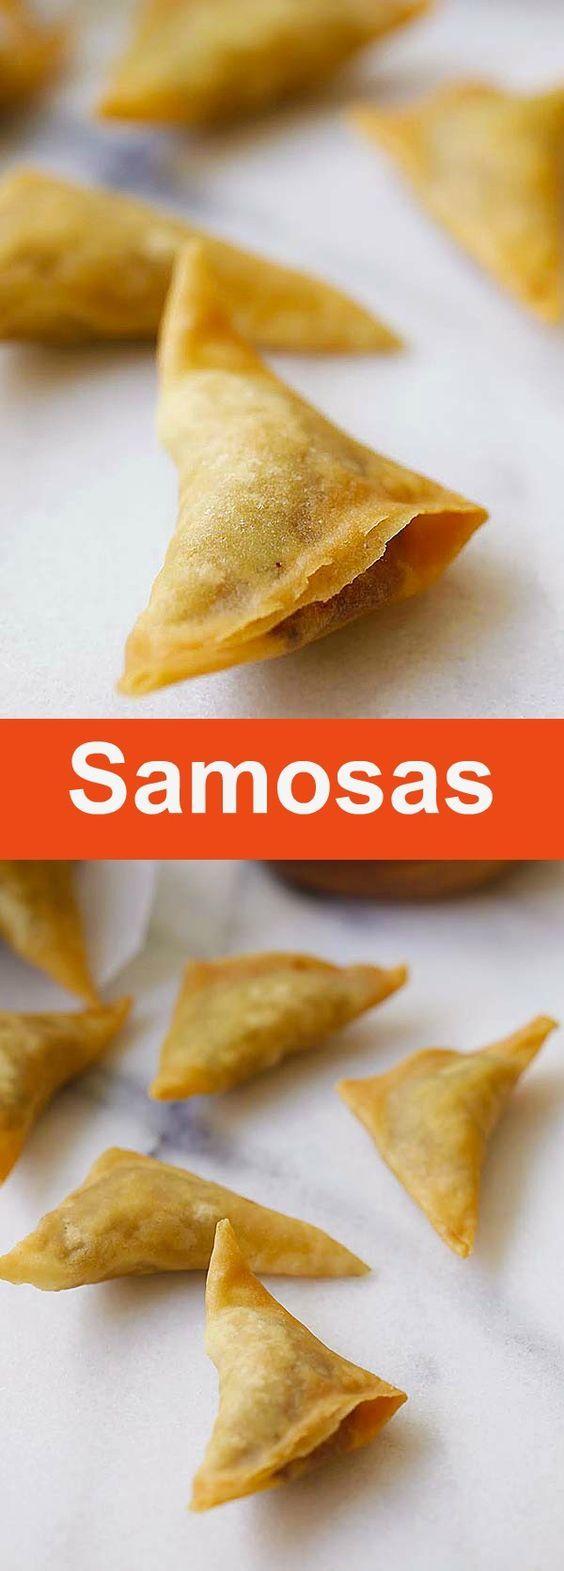 Easy Samosa – Samosa is an Indian deep-fried appetizer filled with spiced potatoes. Fail-proof samosa recipe, so good   rasamalaysia.com